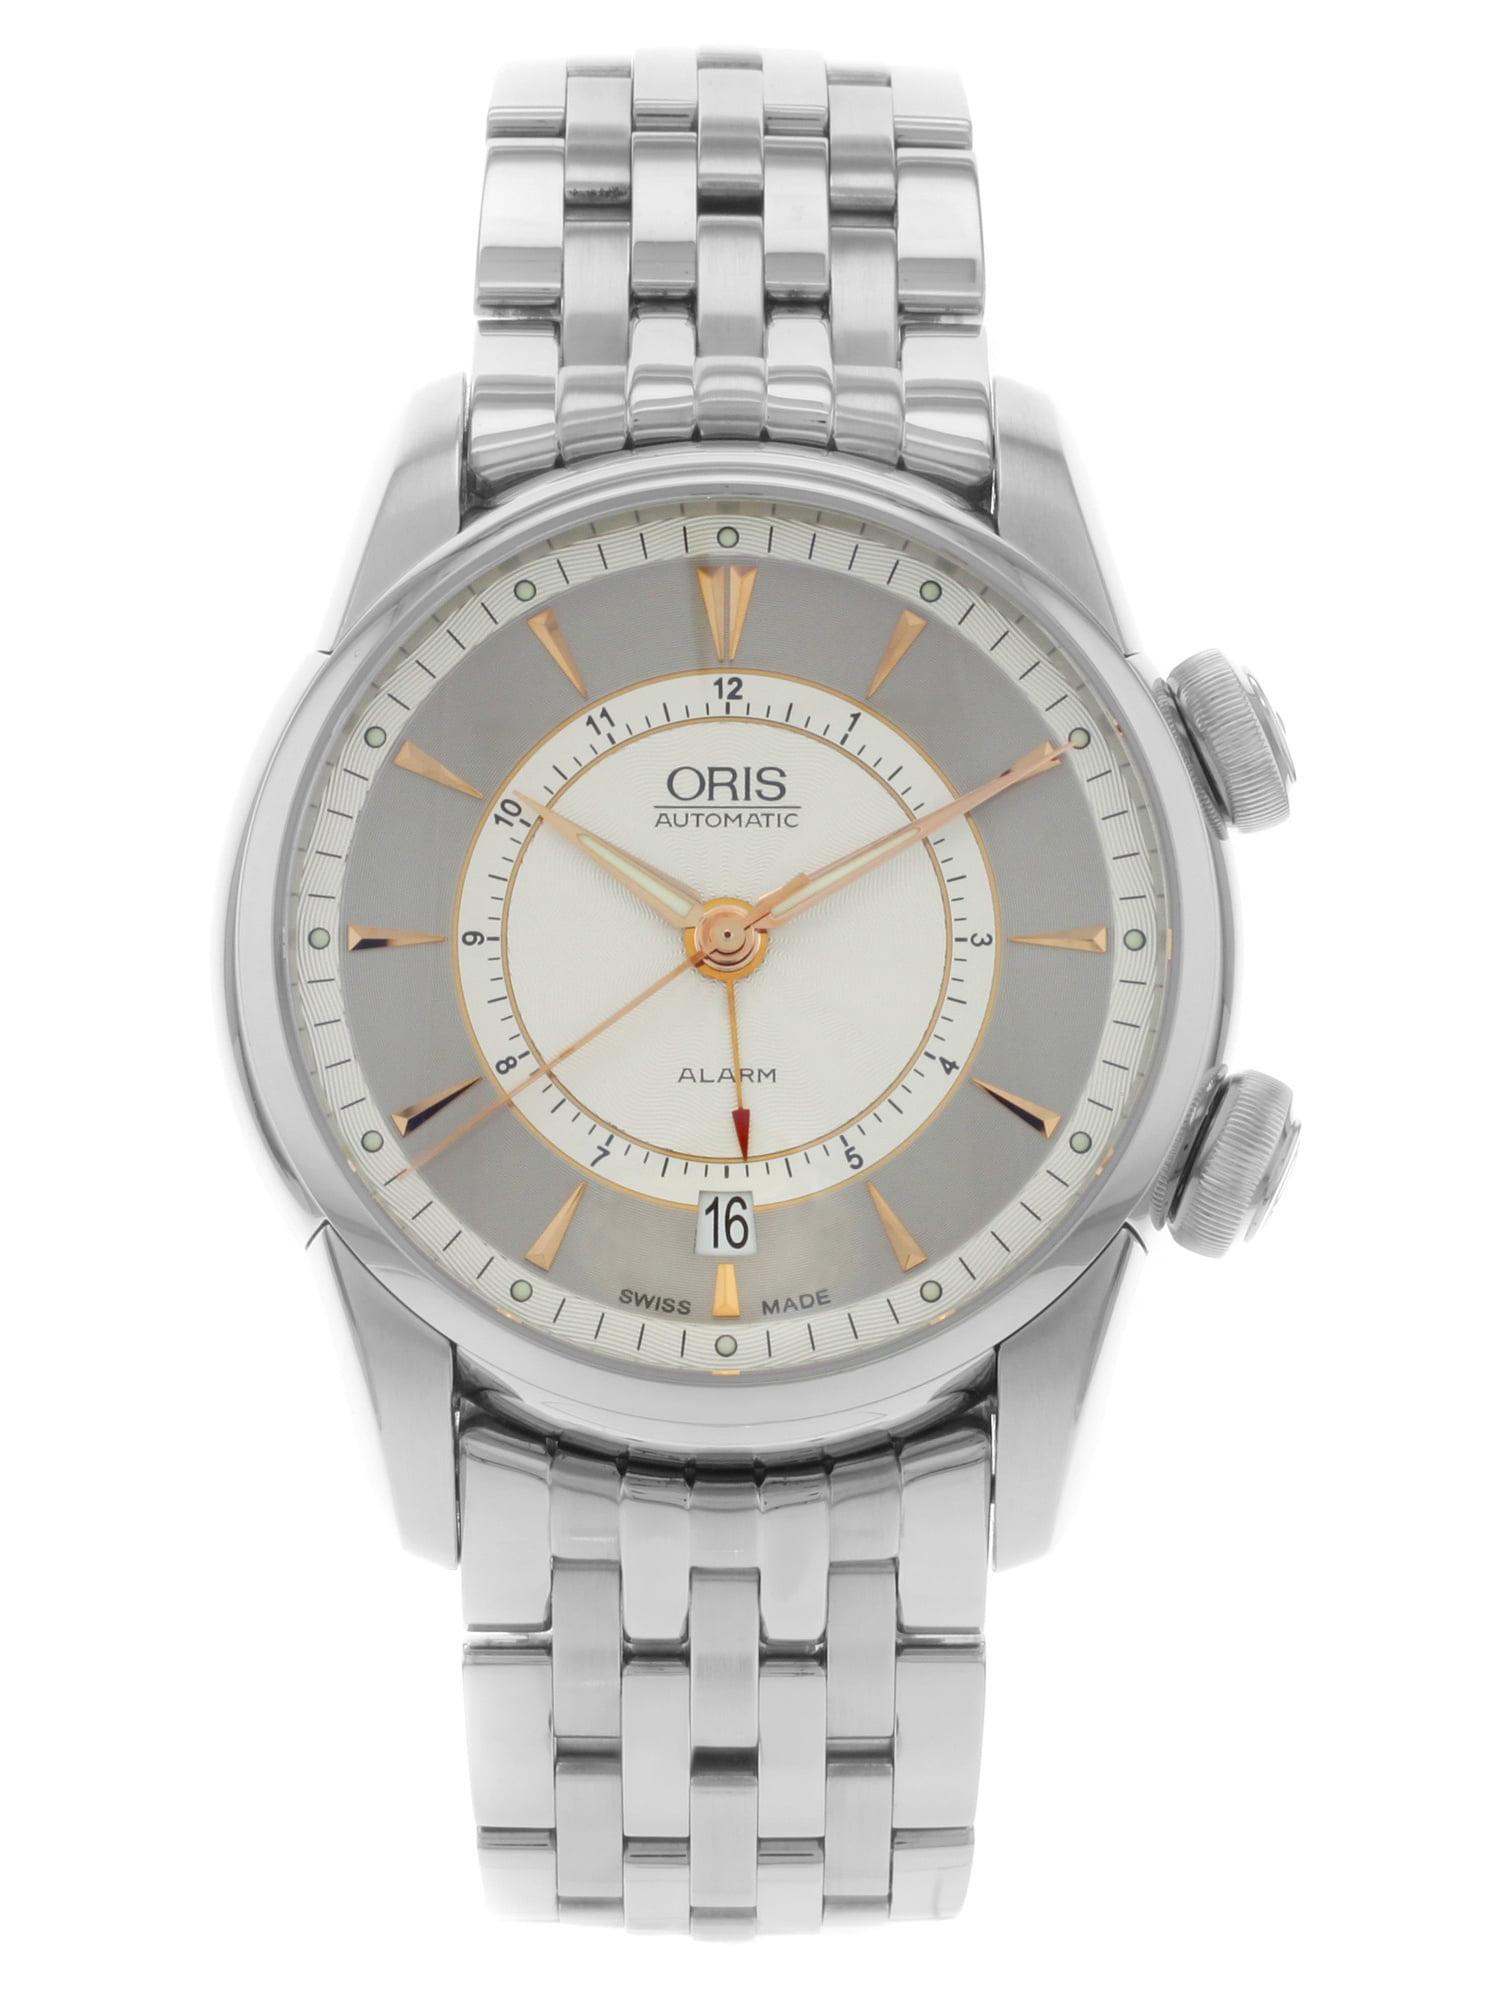 New Oris Artelier Alarm 01 908 7607 4051-Set-MB Stainless Steel Automatic Men's Watch